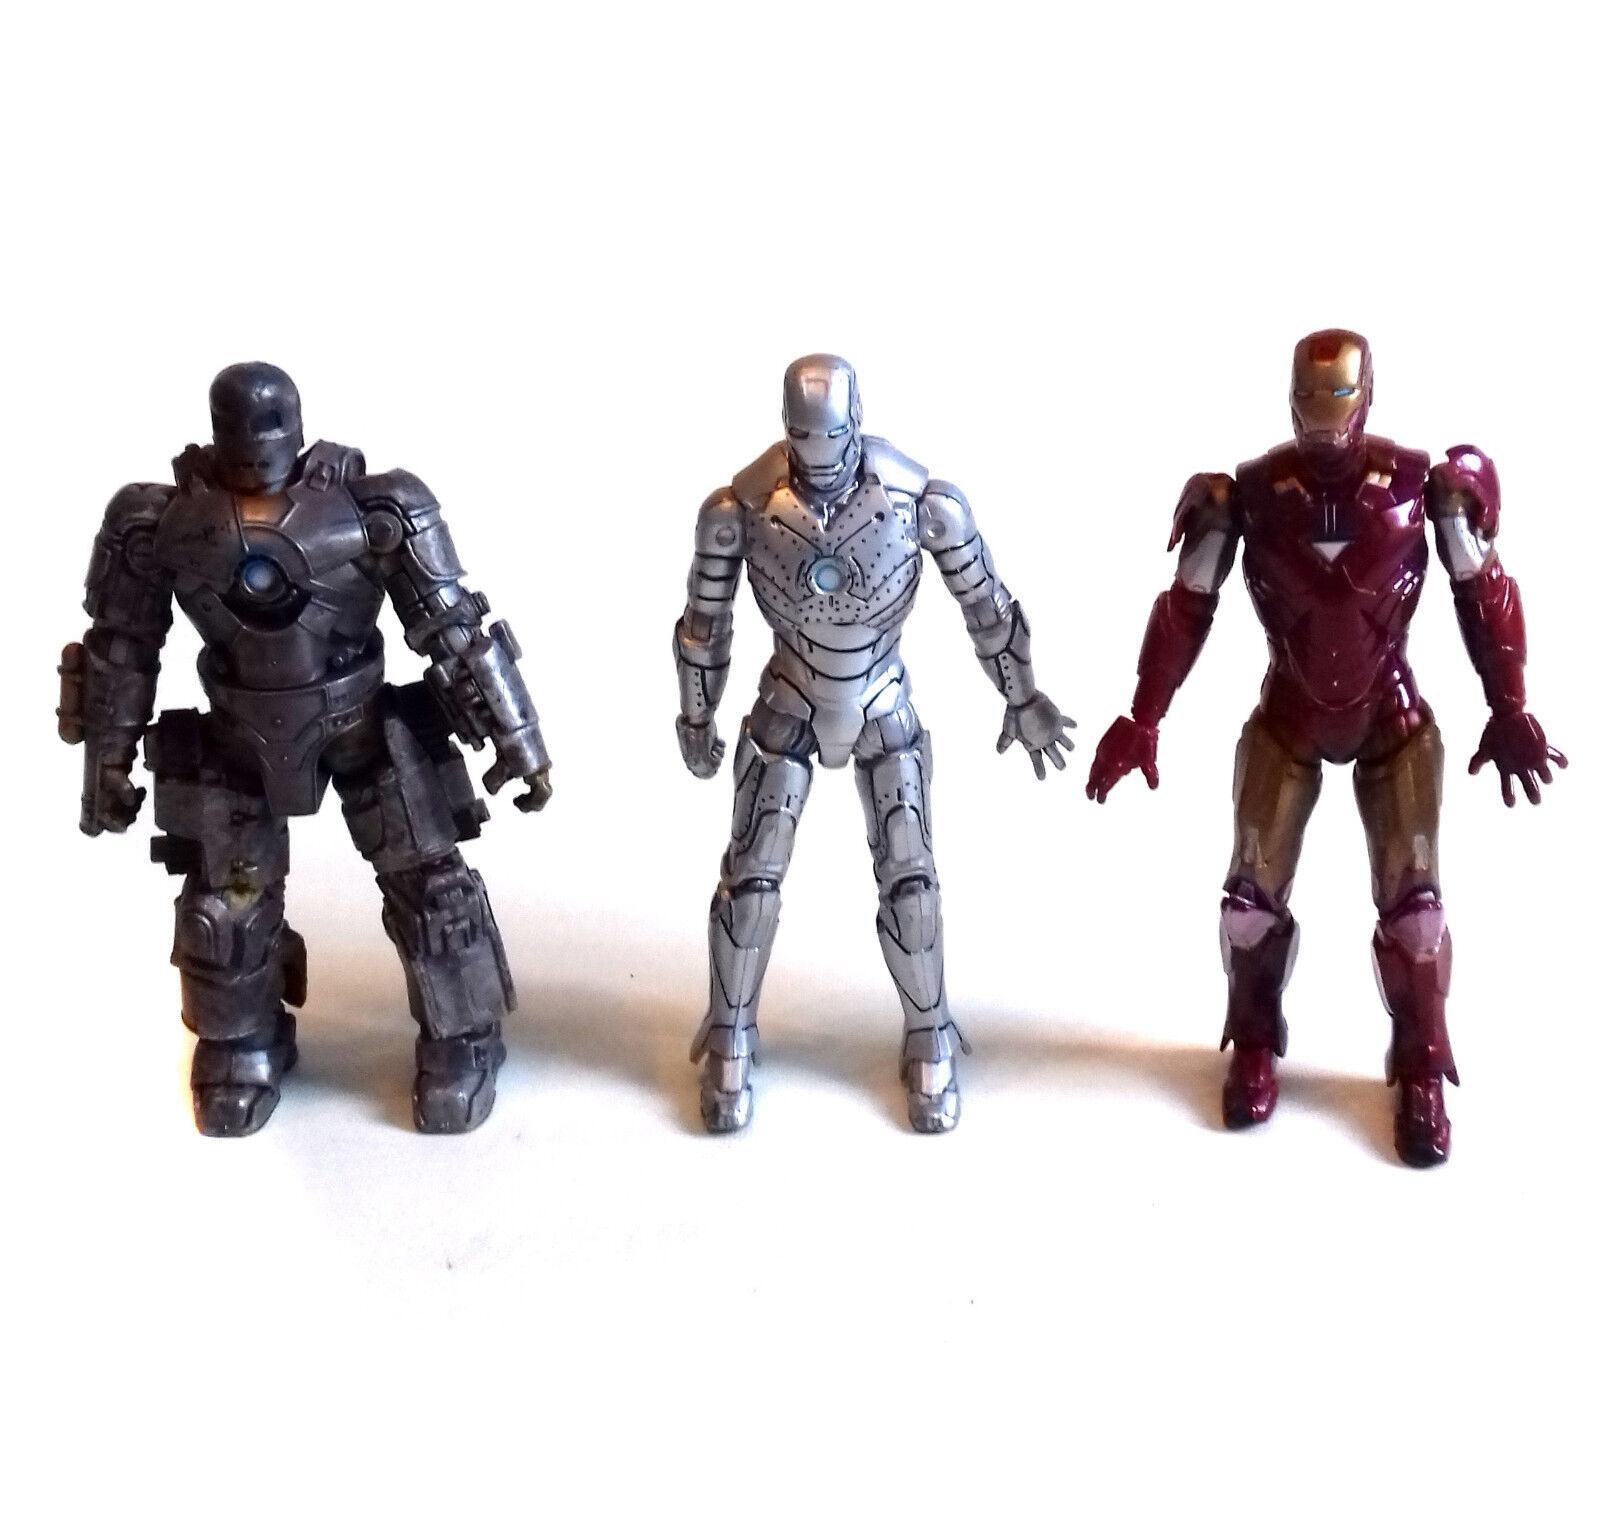 Marvel Comics Legends Movie IRON MAN Evolution Set of 3.75  figures, avengers